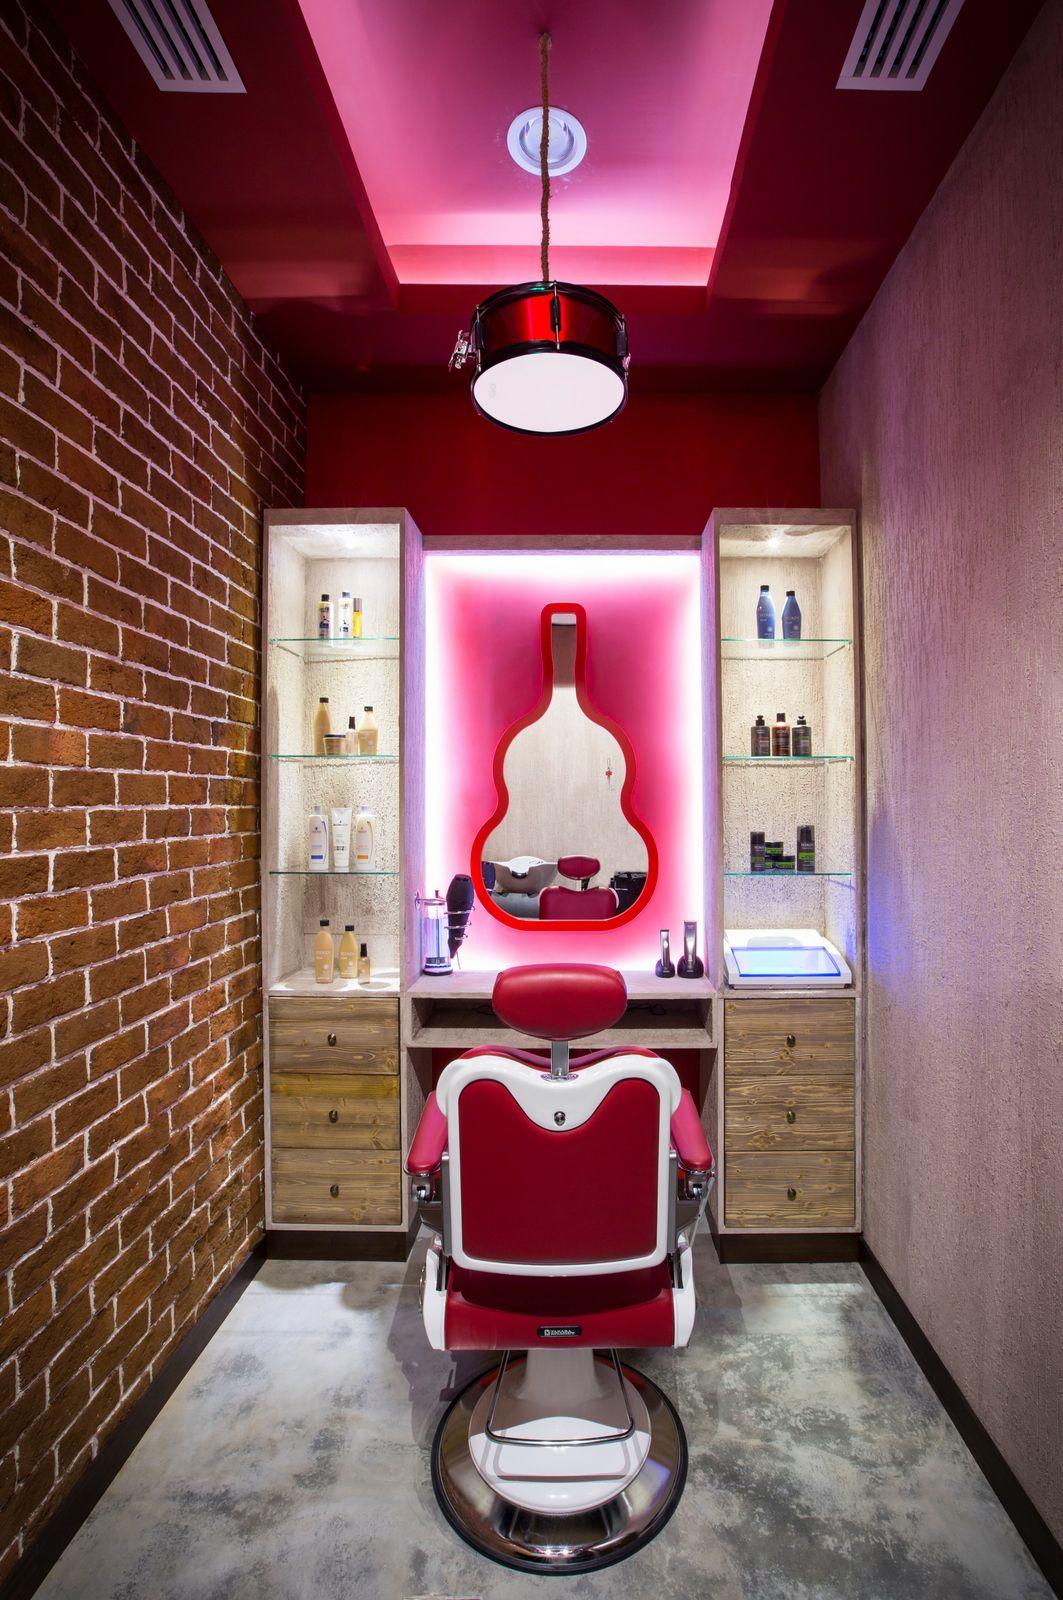 Vip Room Umm Suqeim Boutique Spa Salon Furniture Vip Room Red nail salon dubai read reviews and